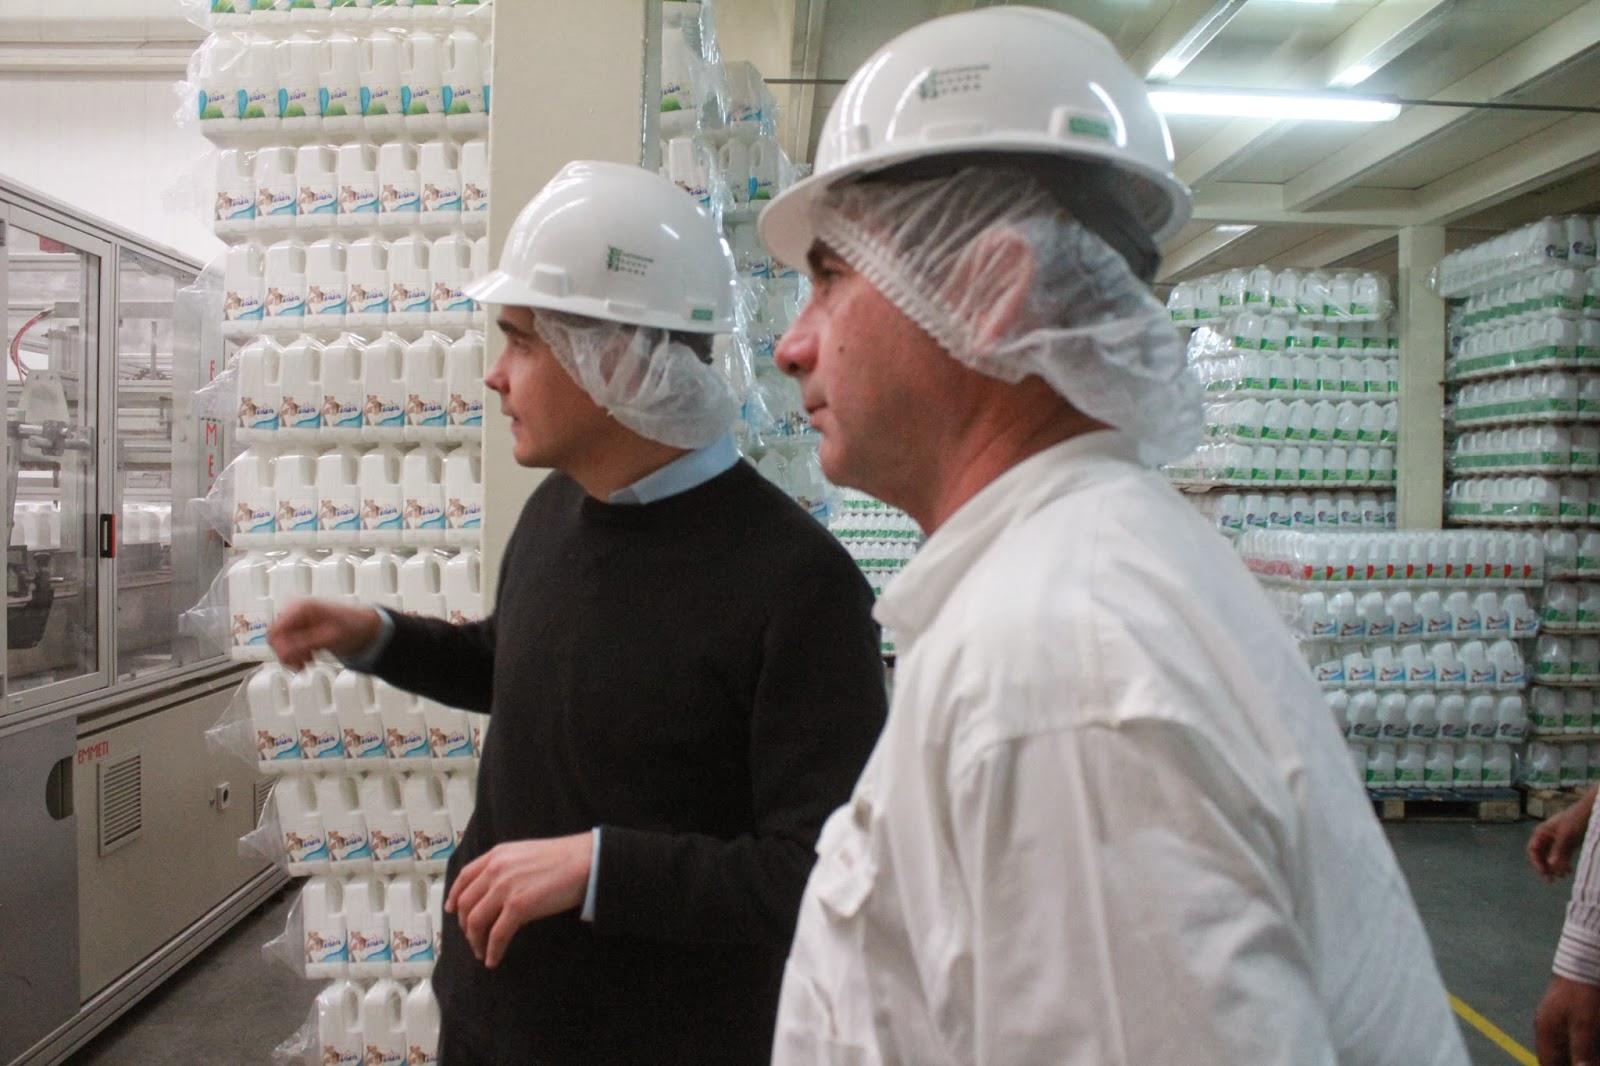 fabrica de leche pasteurizacion: